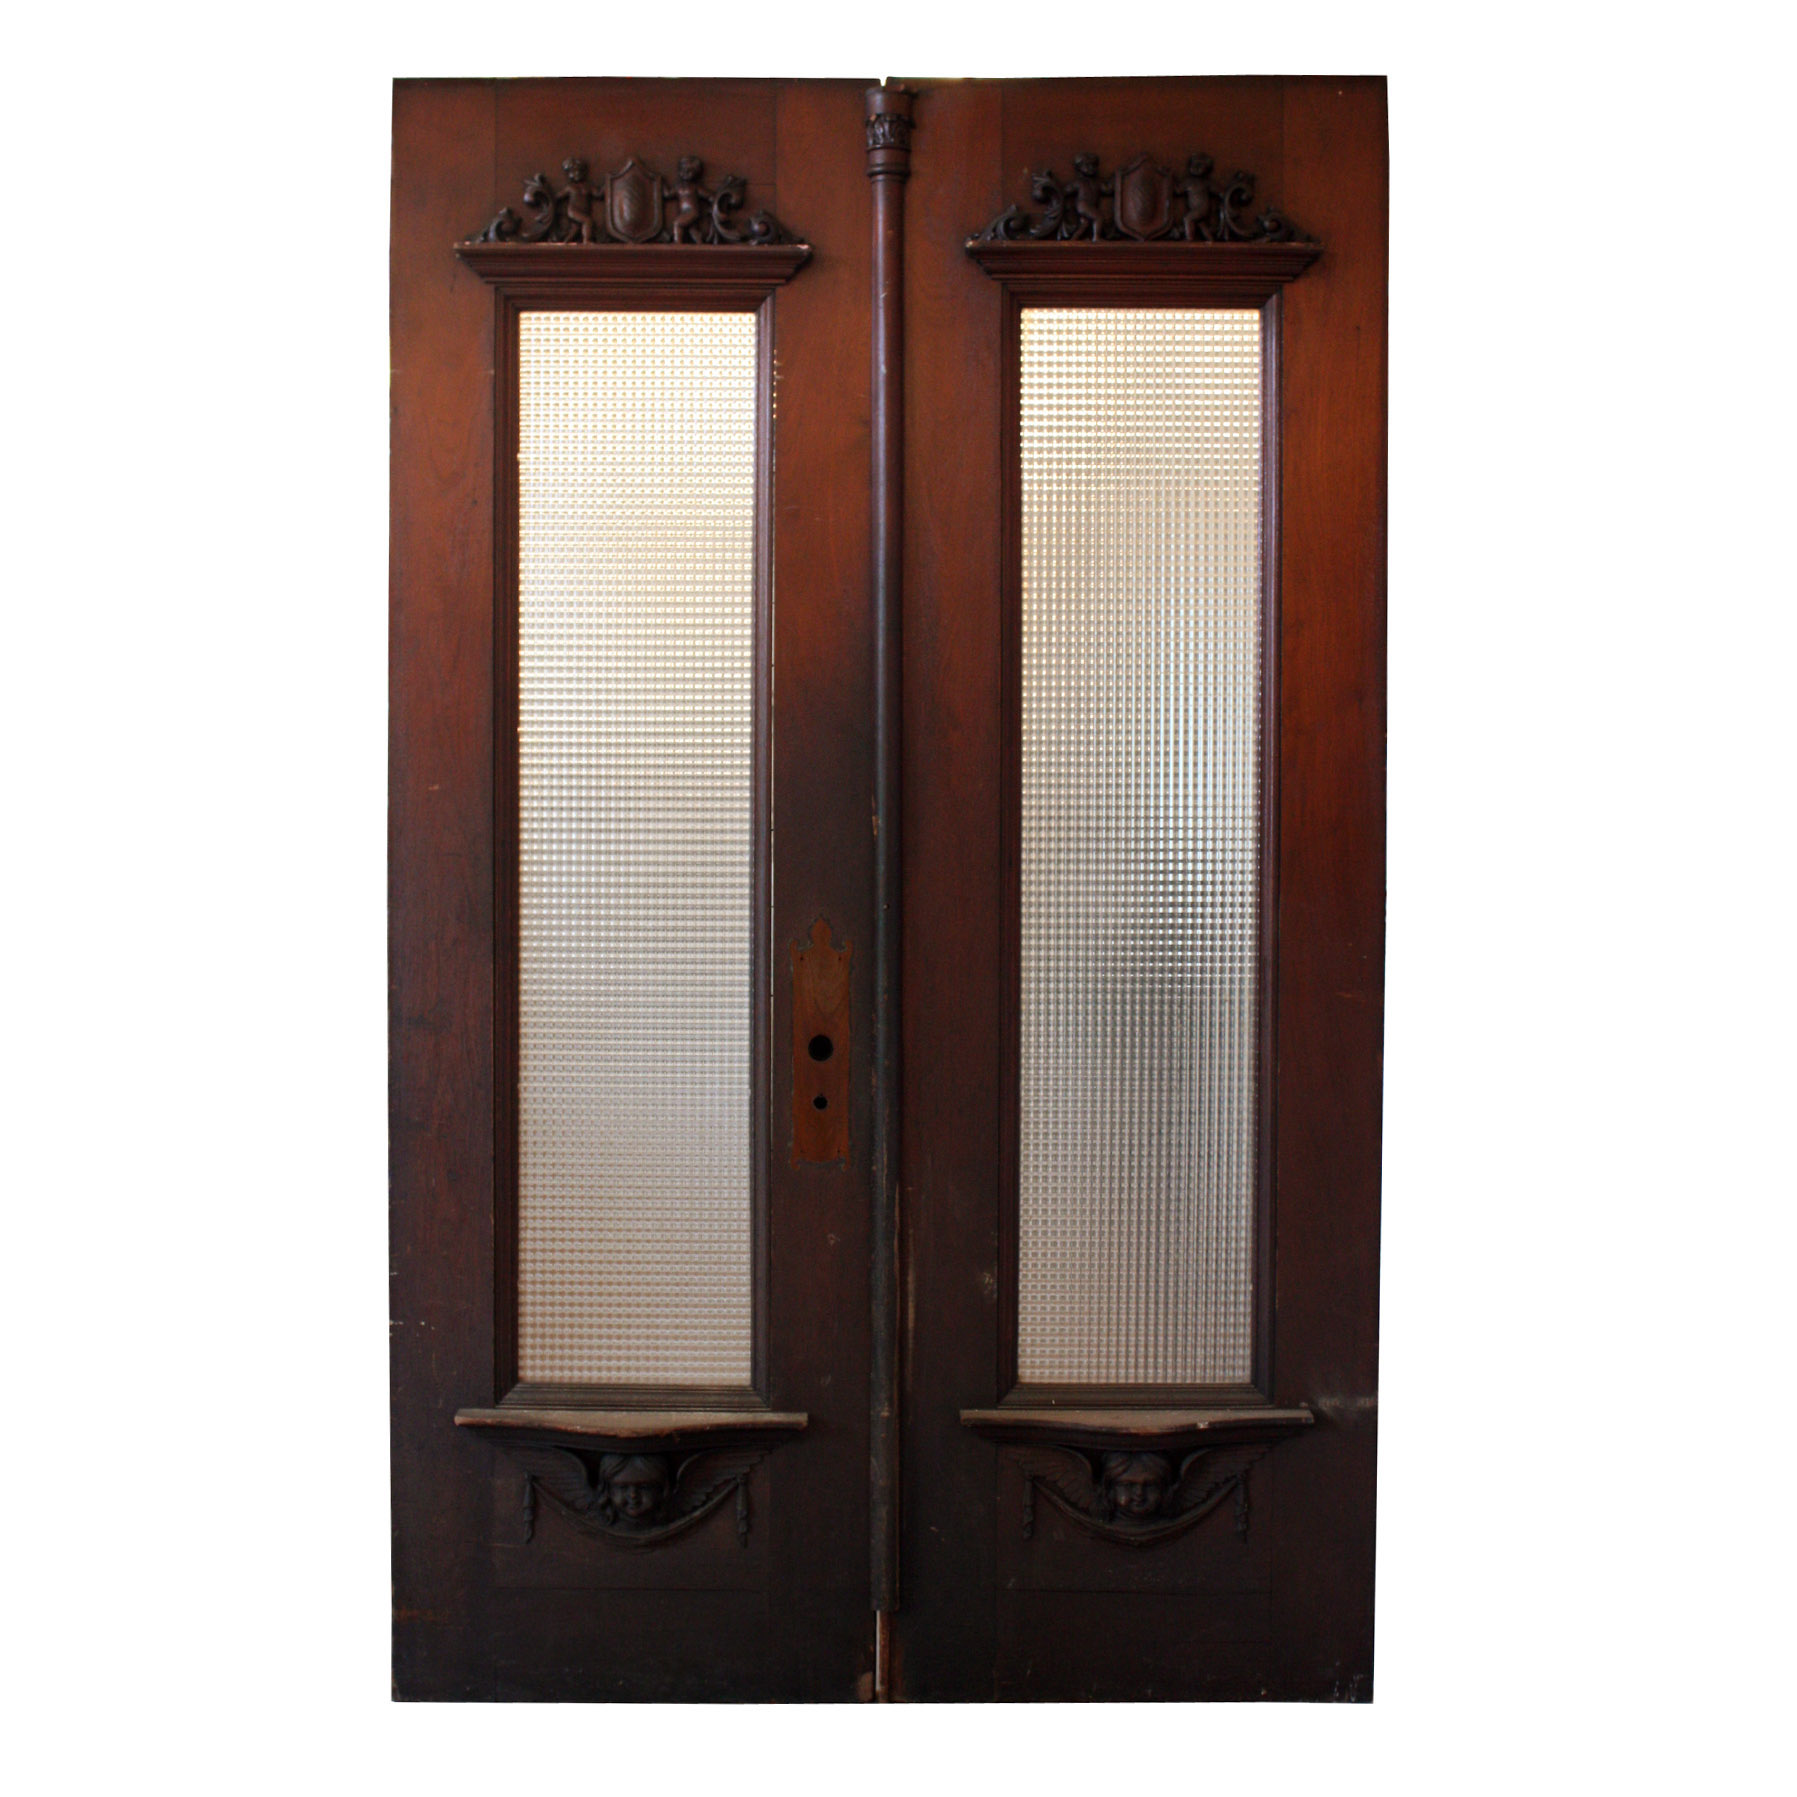 Amazing antique figural exterior double doors with windows for Exterior double doors for sale